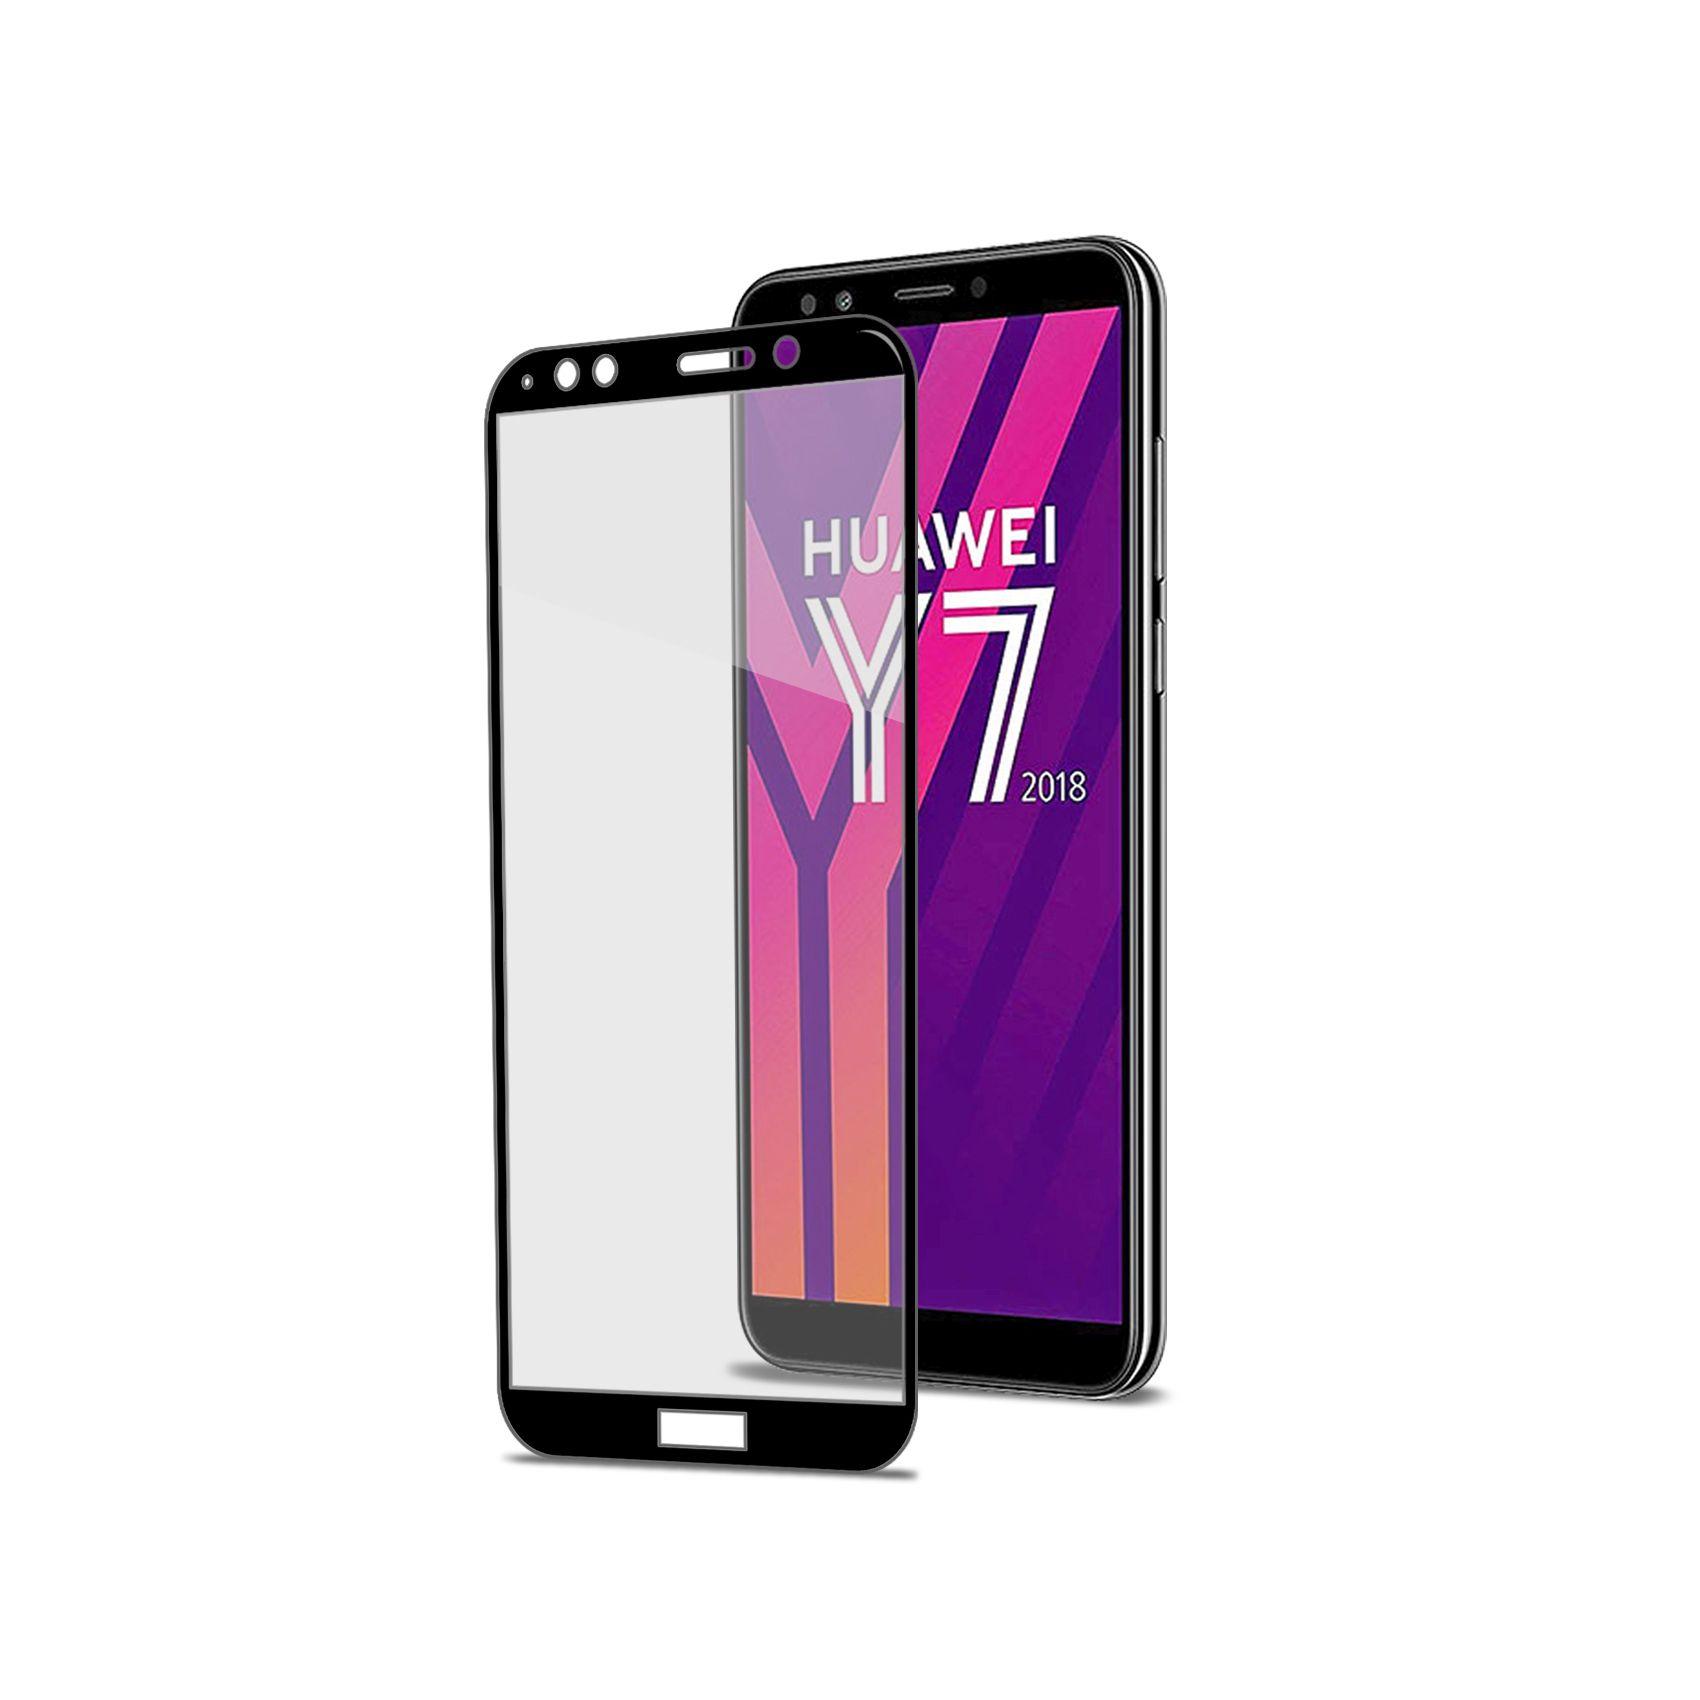 Ochranné tvrzené sklo CELLY Full Glass pro Huawei Y7 (2018), černé